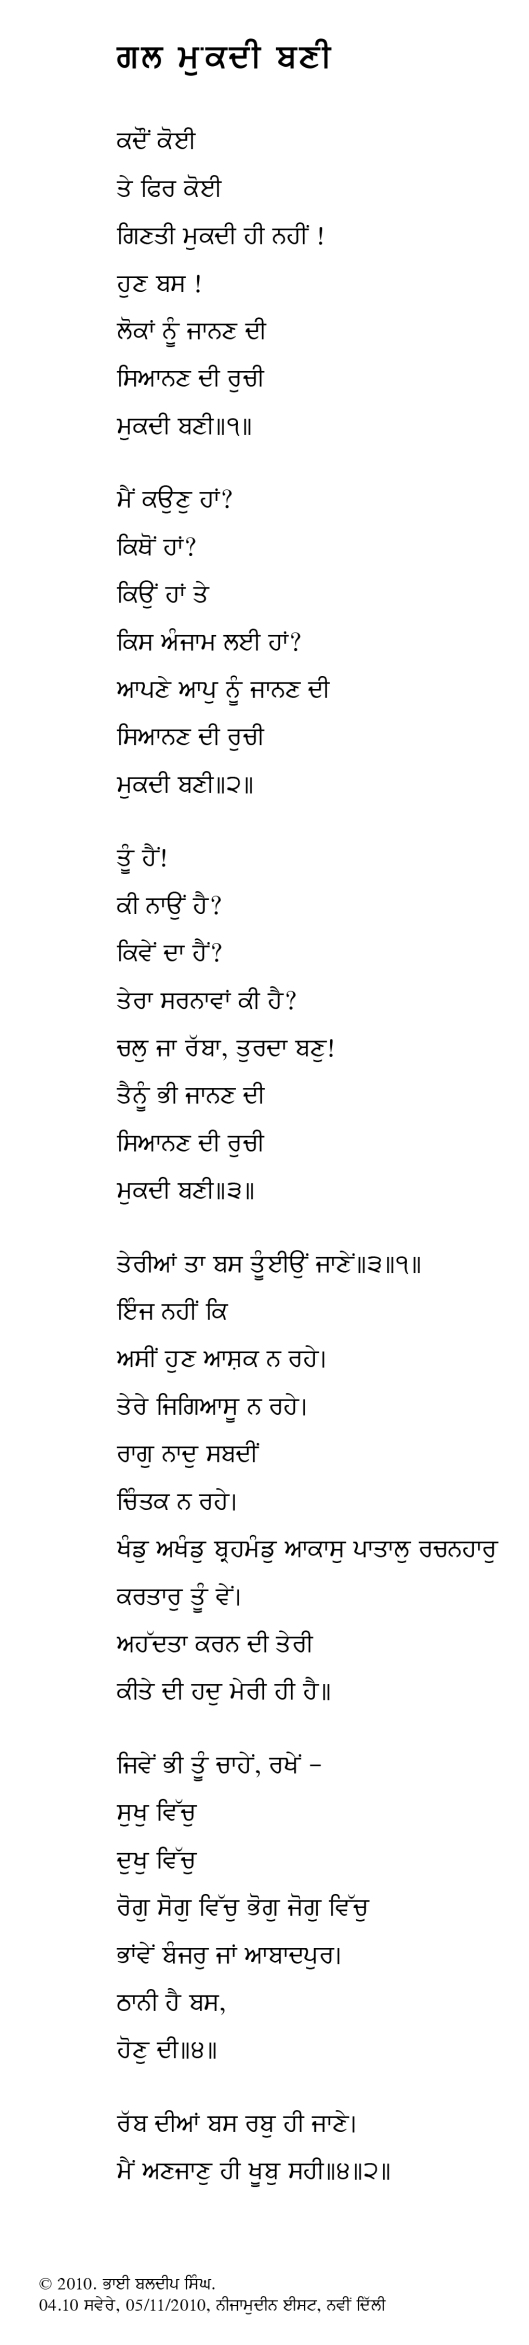 Microsoft Word - Mukdi Bani bbs 05112010.doc